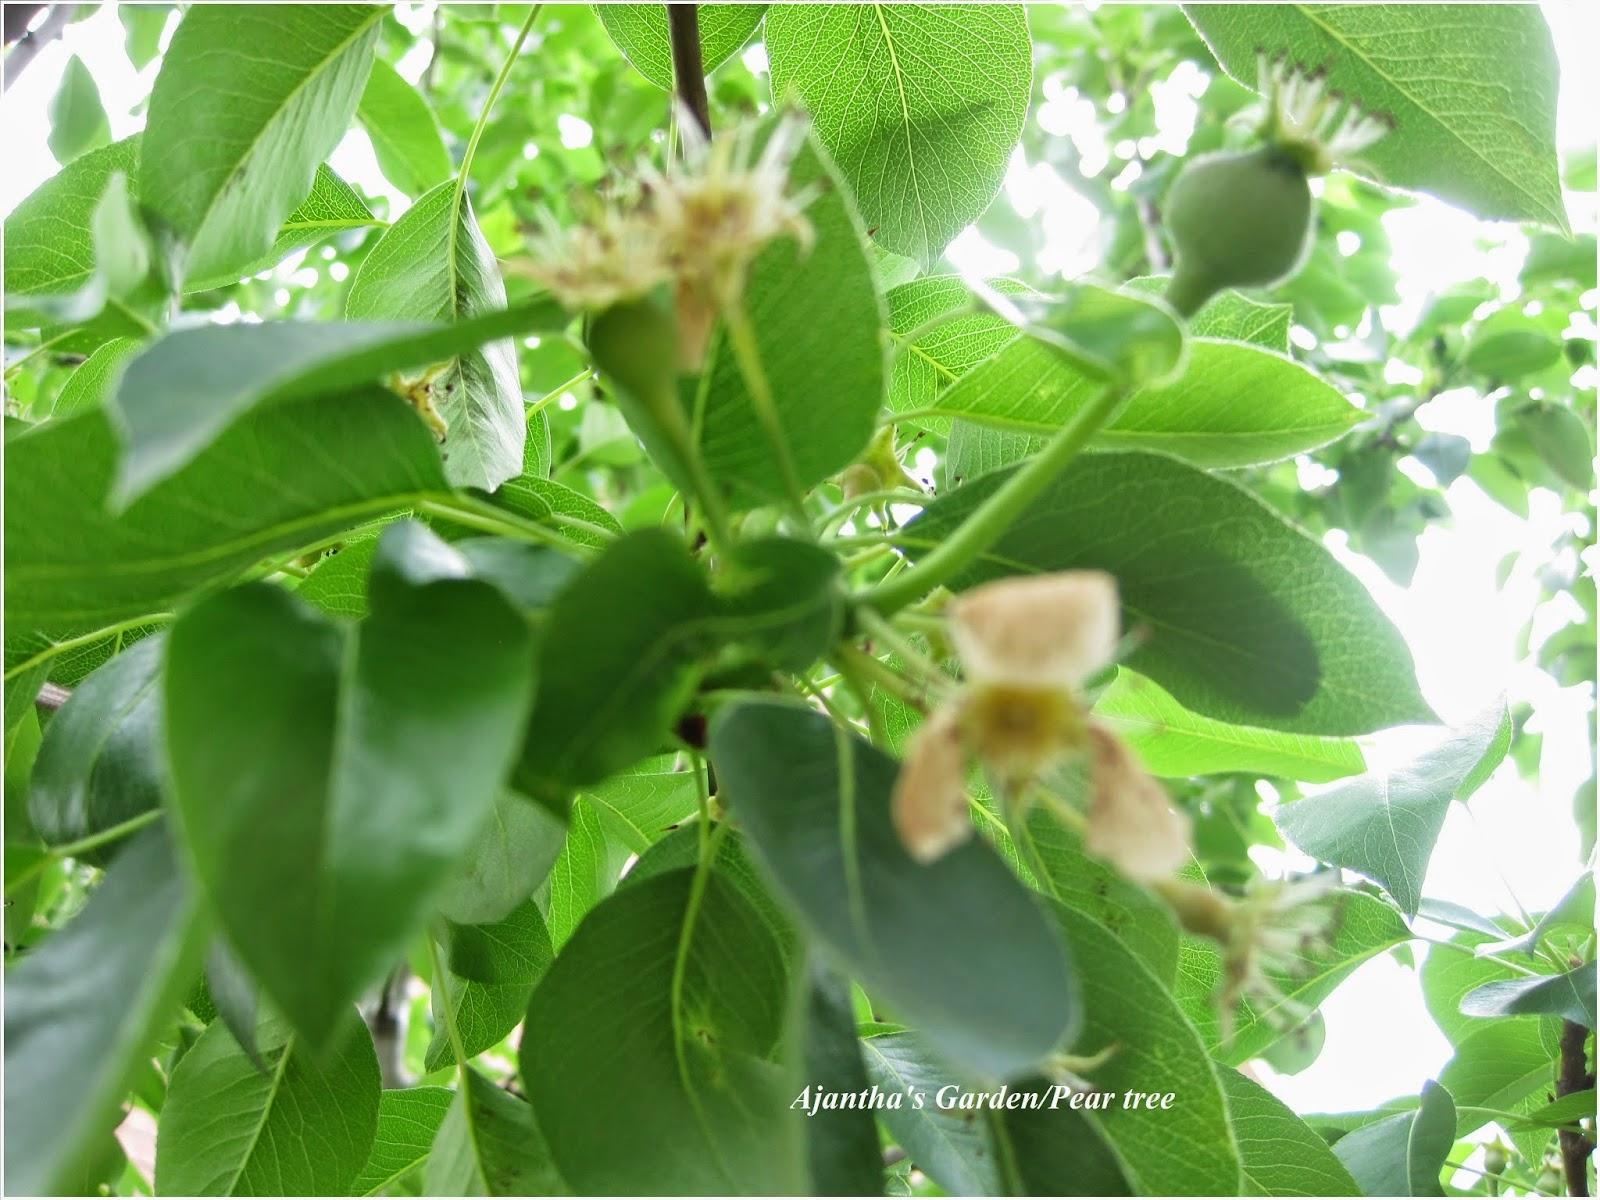 Ajantha's Garden/ Pear tree